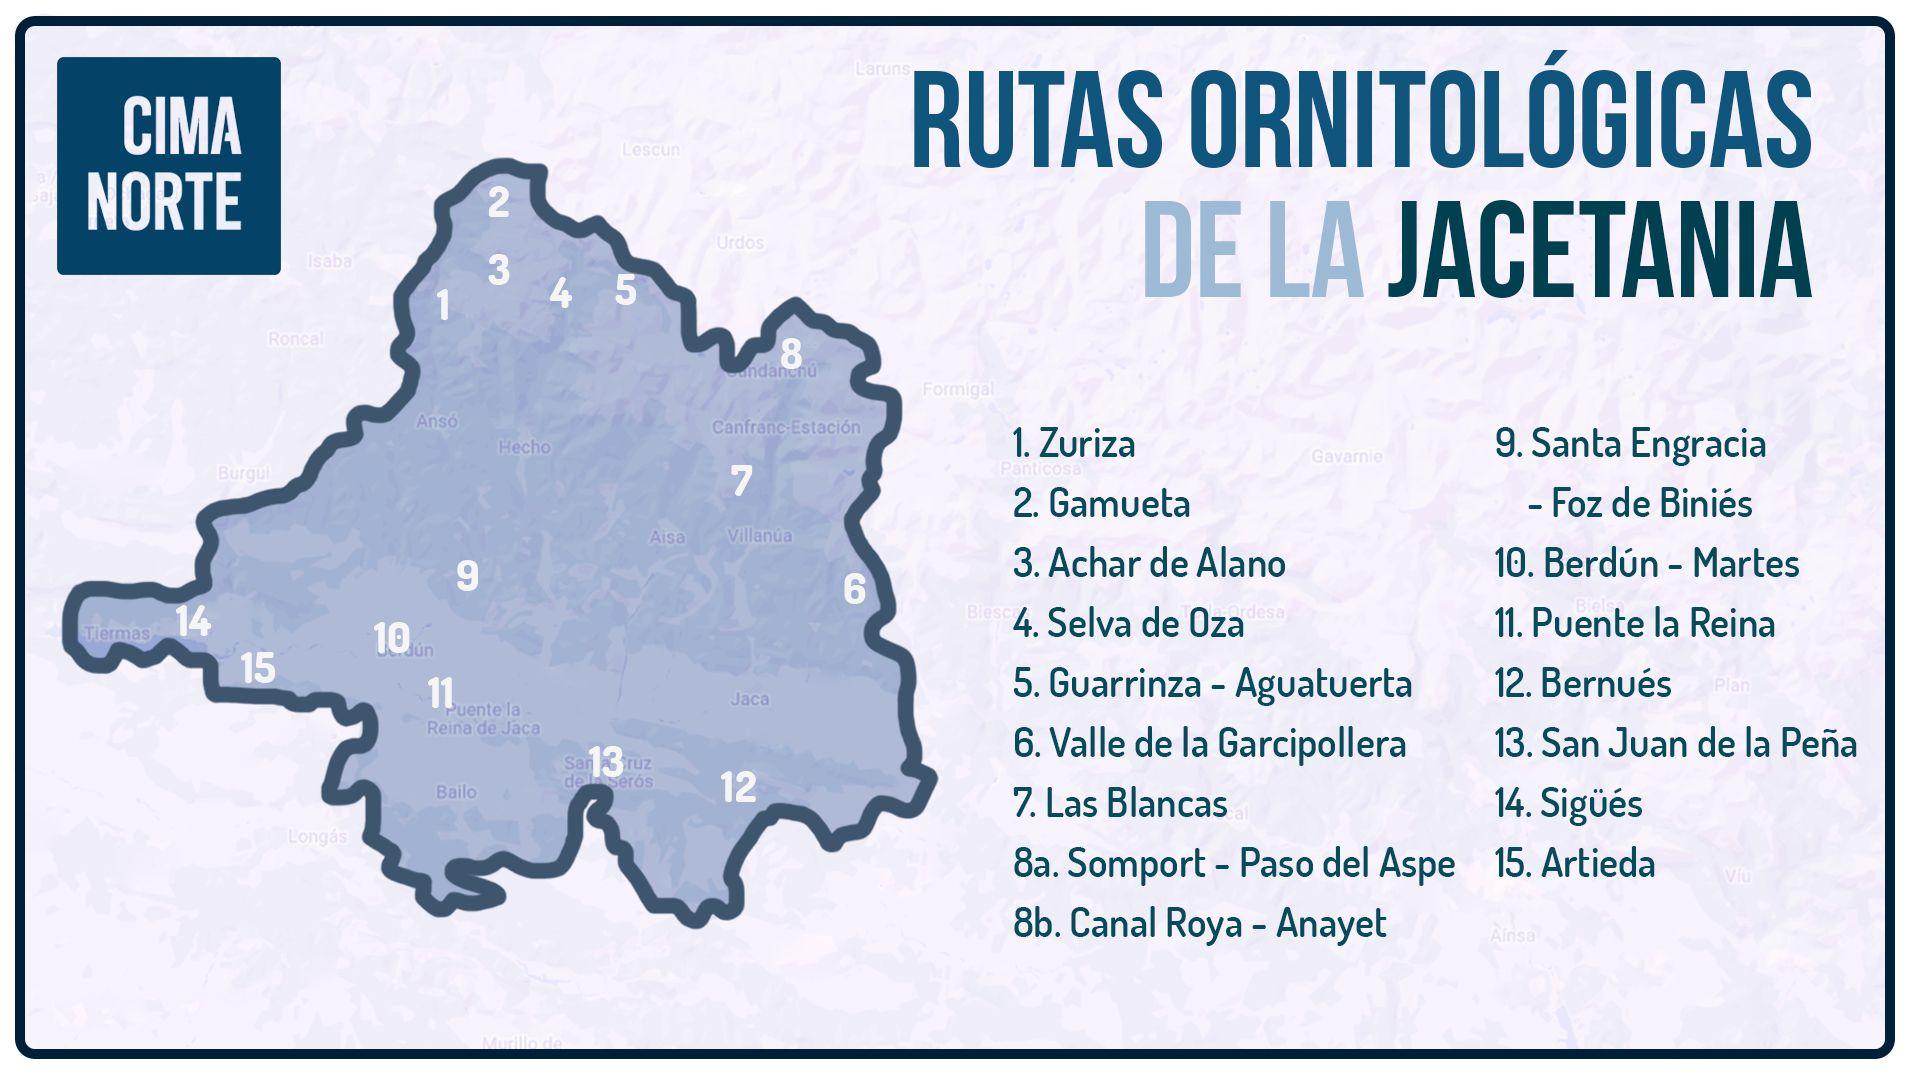 rutas ornitológicas de la jacetania mapa infografía cima norte